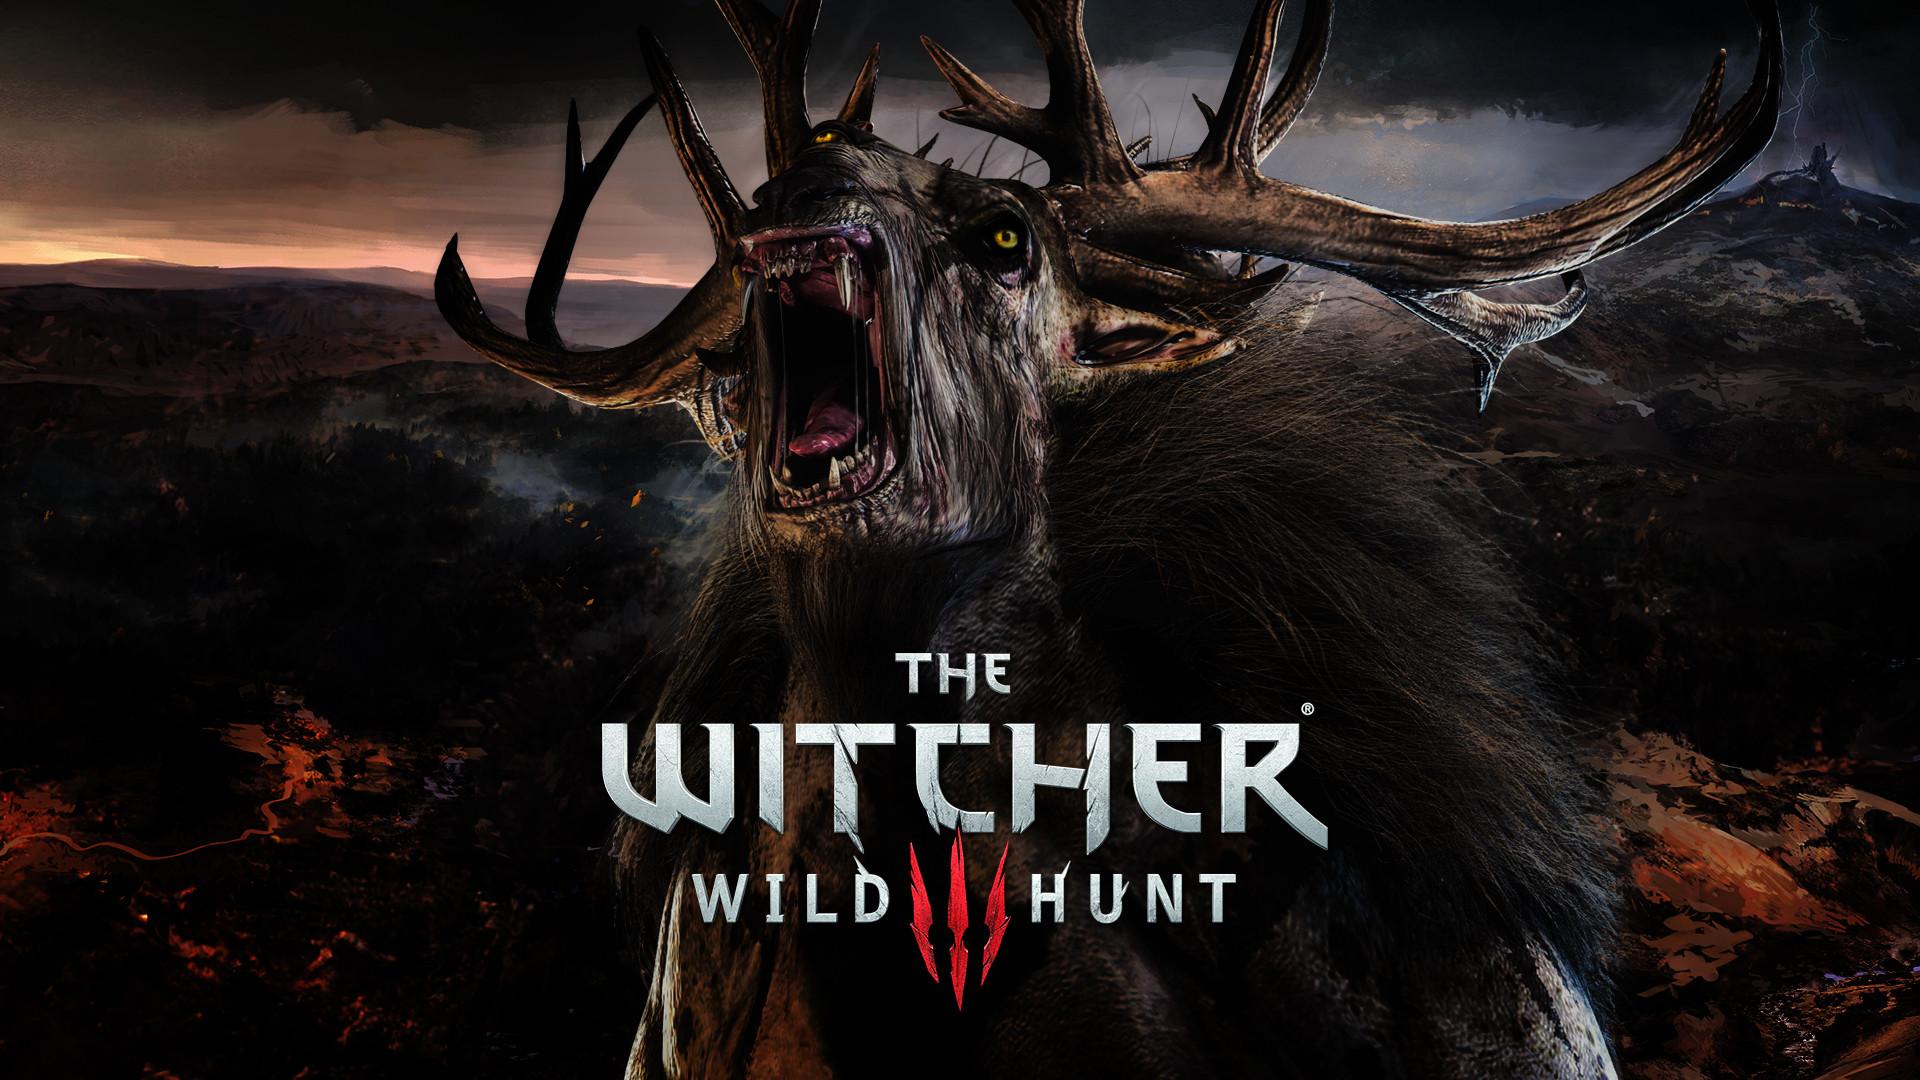 … The Witcher 3 : Wild Hunt Wallpaper 7